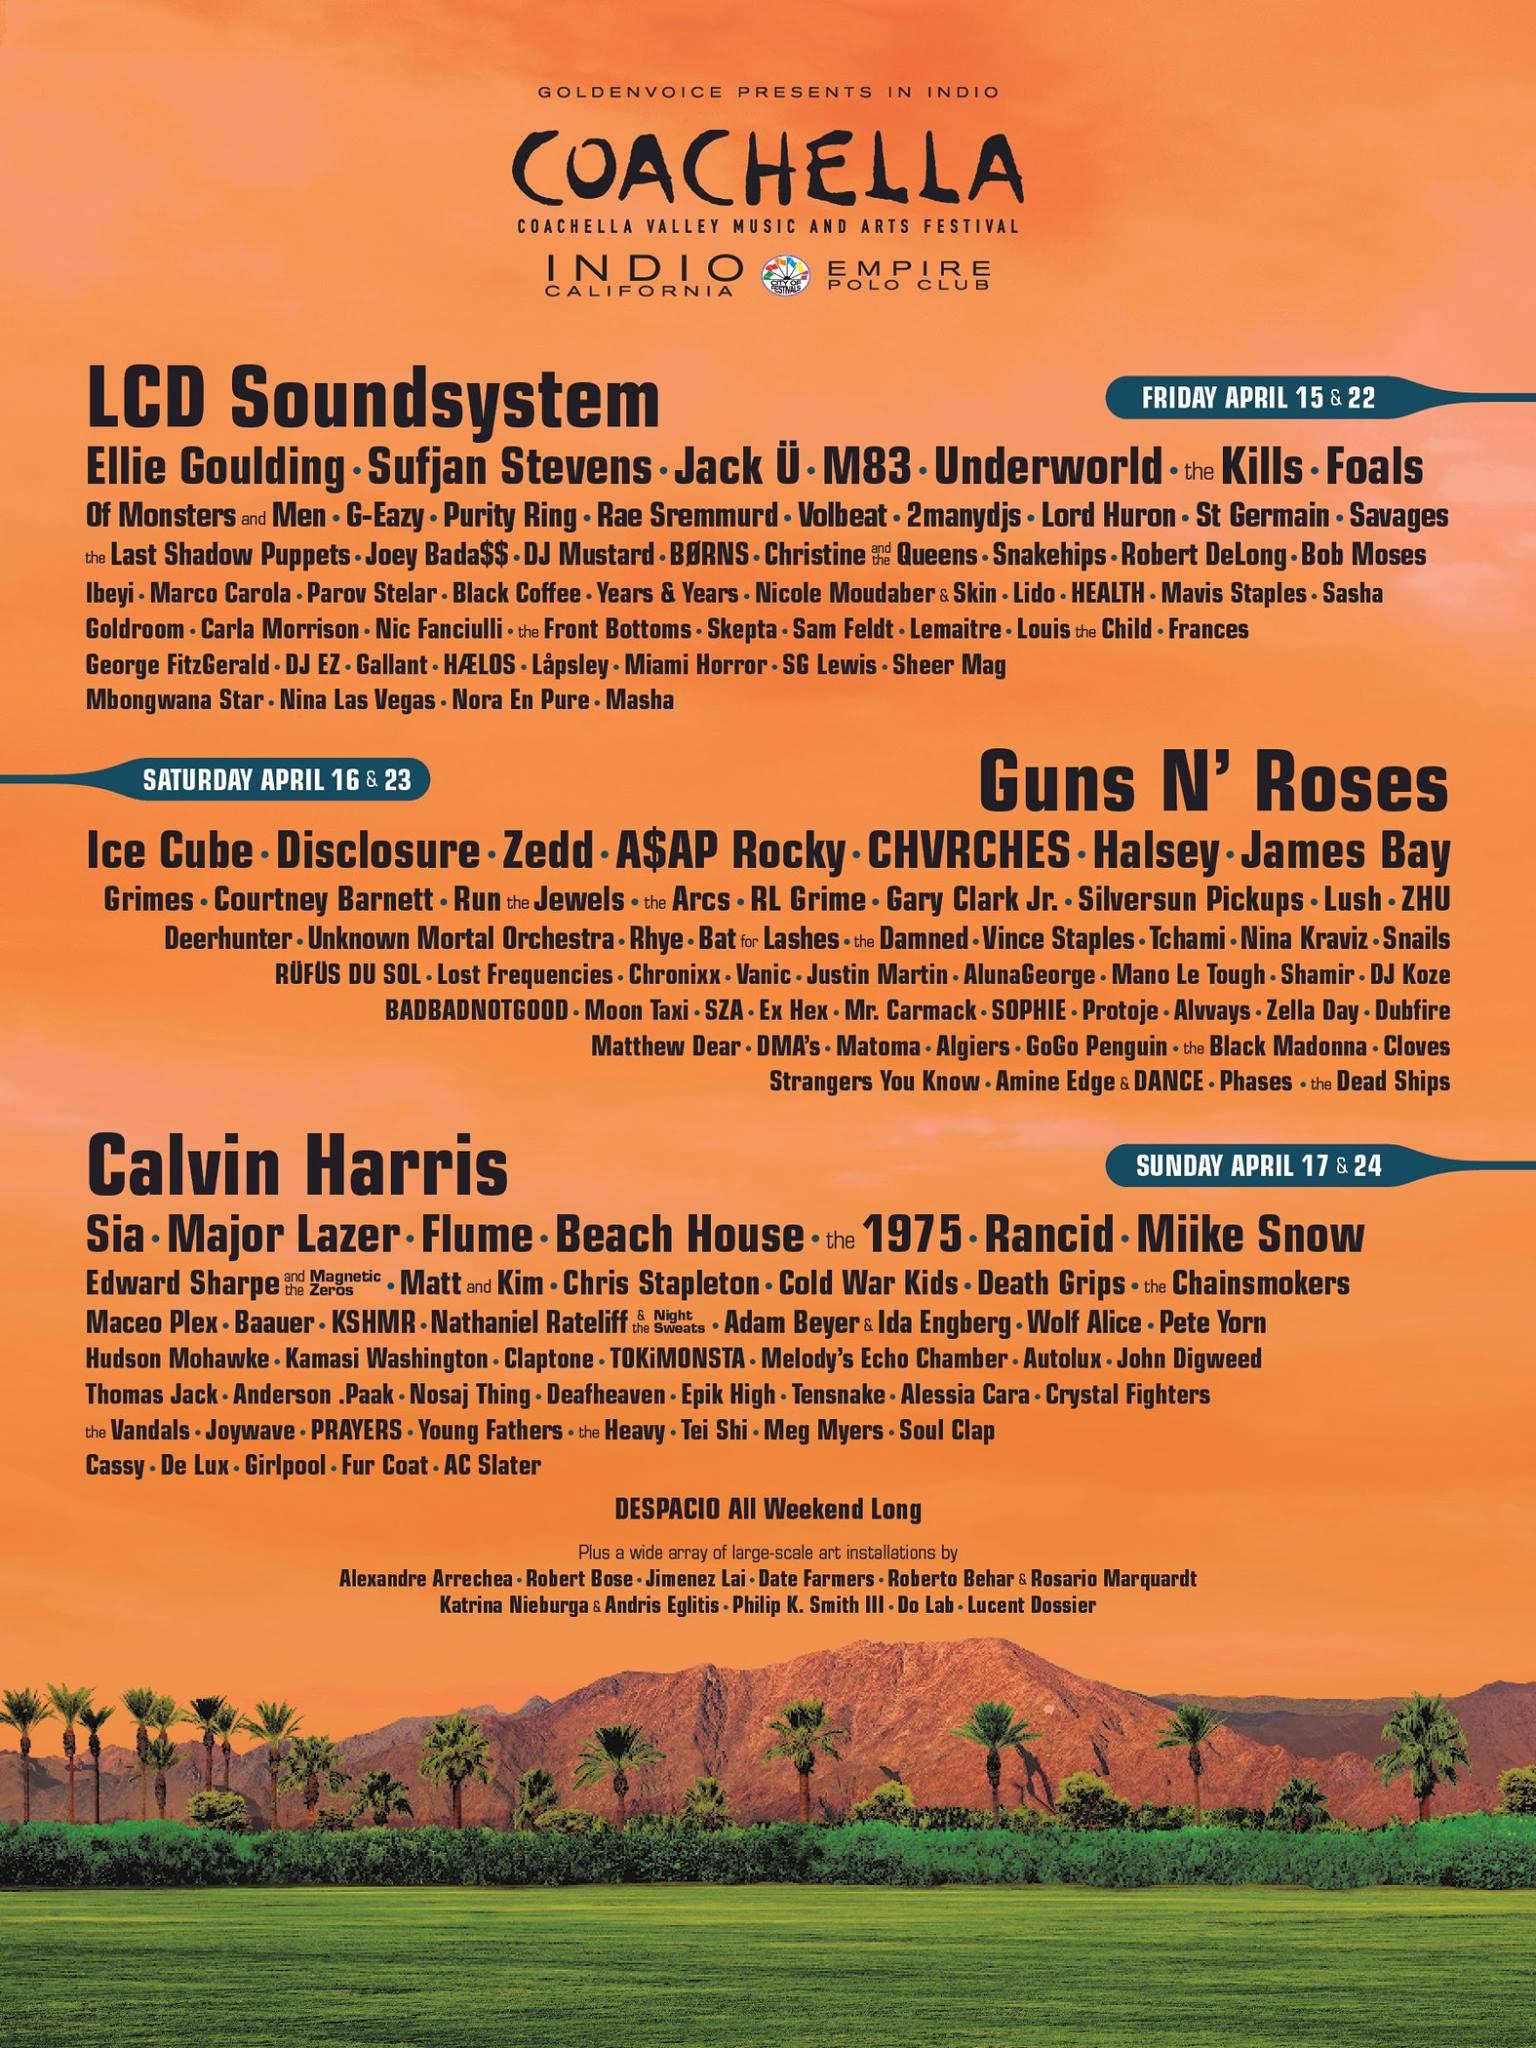 Coachella 2016 line up